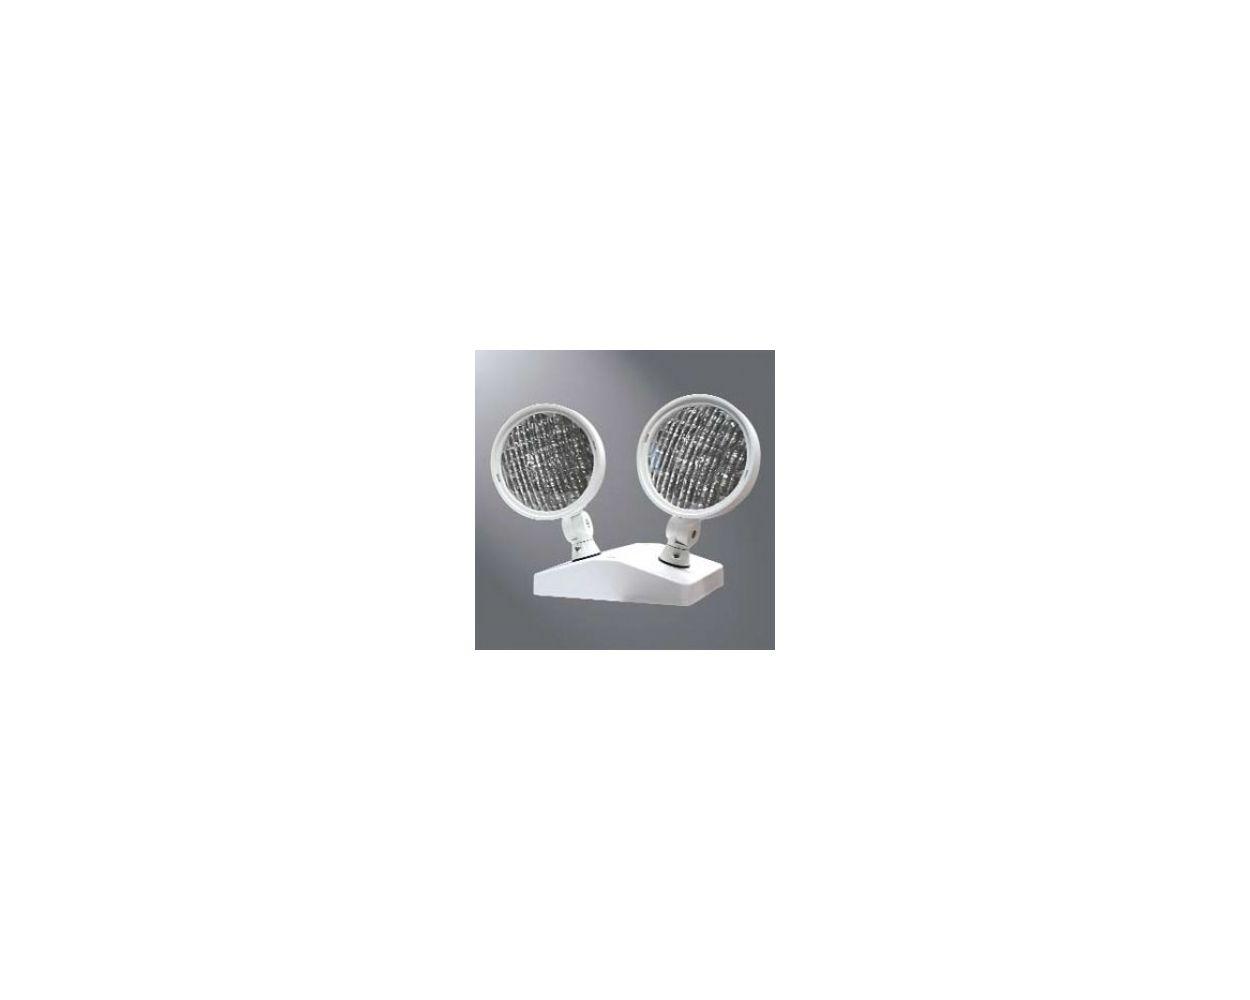 Cooper Atlite Polycarbonate Led 9 6 V Remote 2 Head White Rfled402